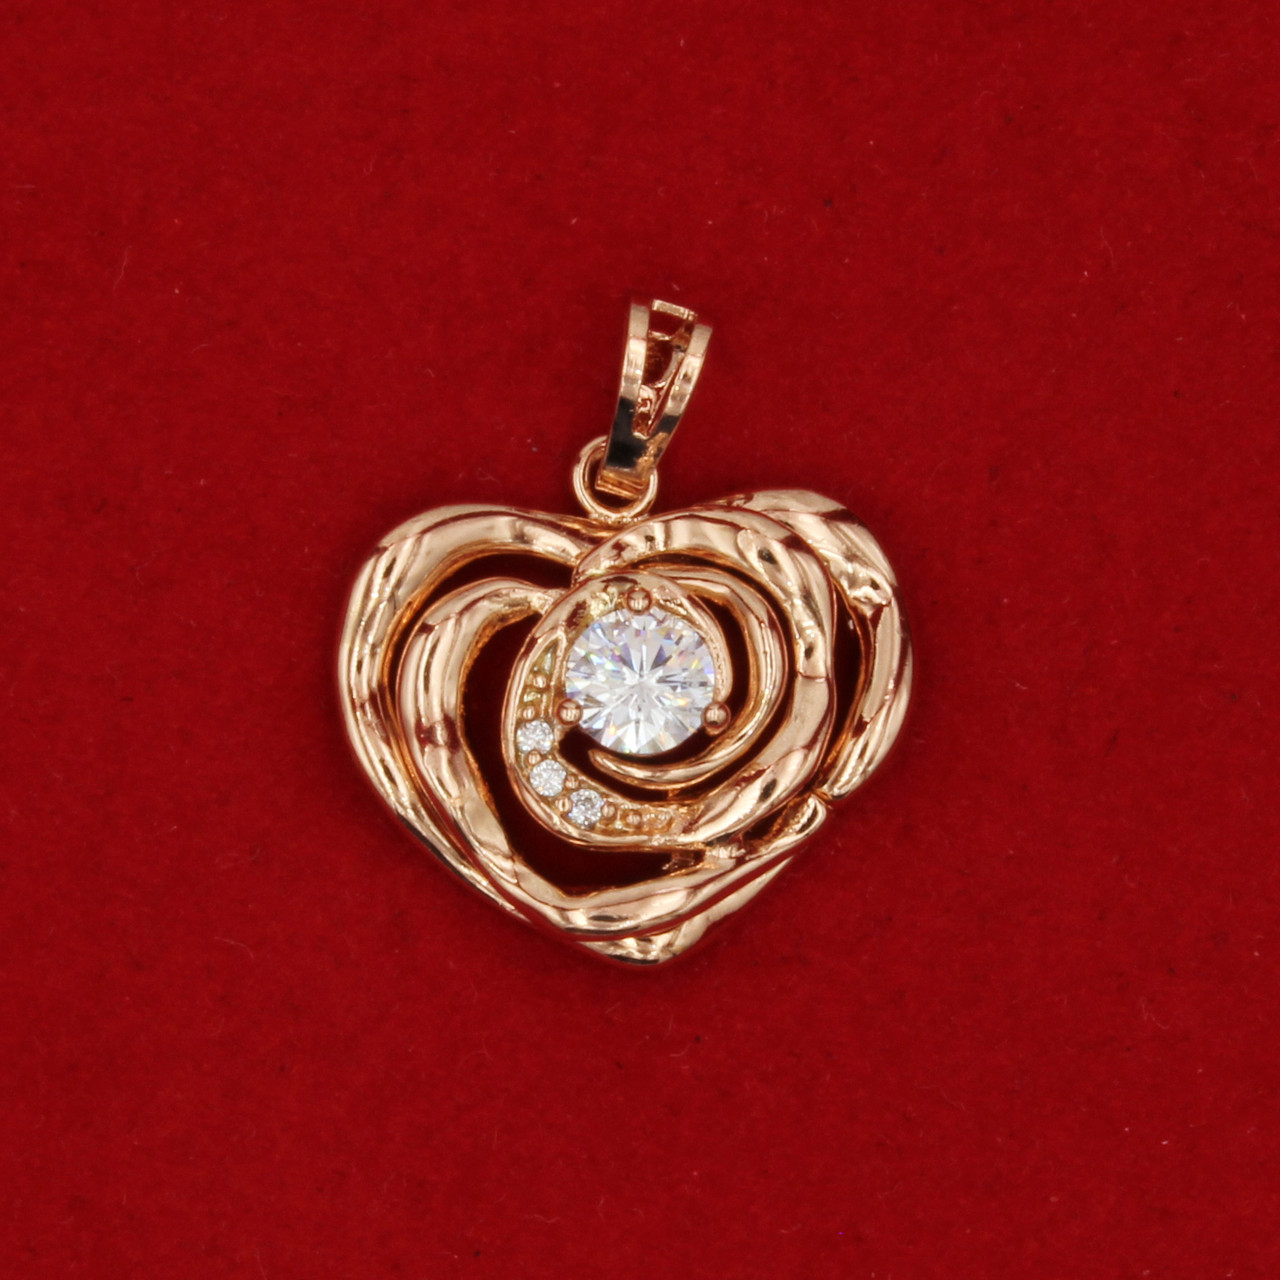 Кулон женский Сердце, позолота, циркон 25мм